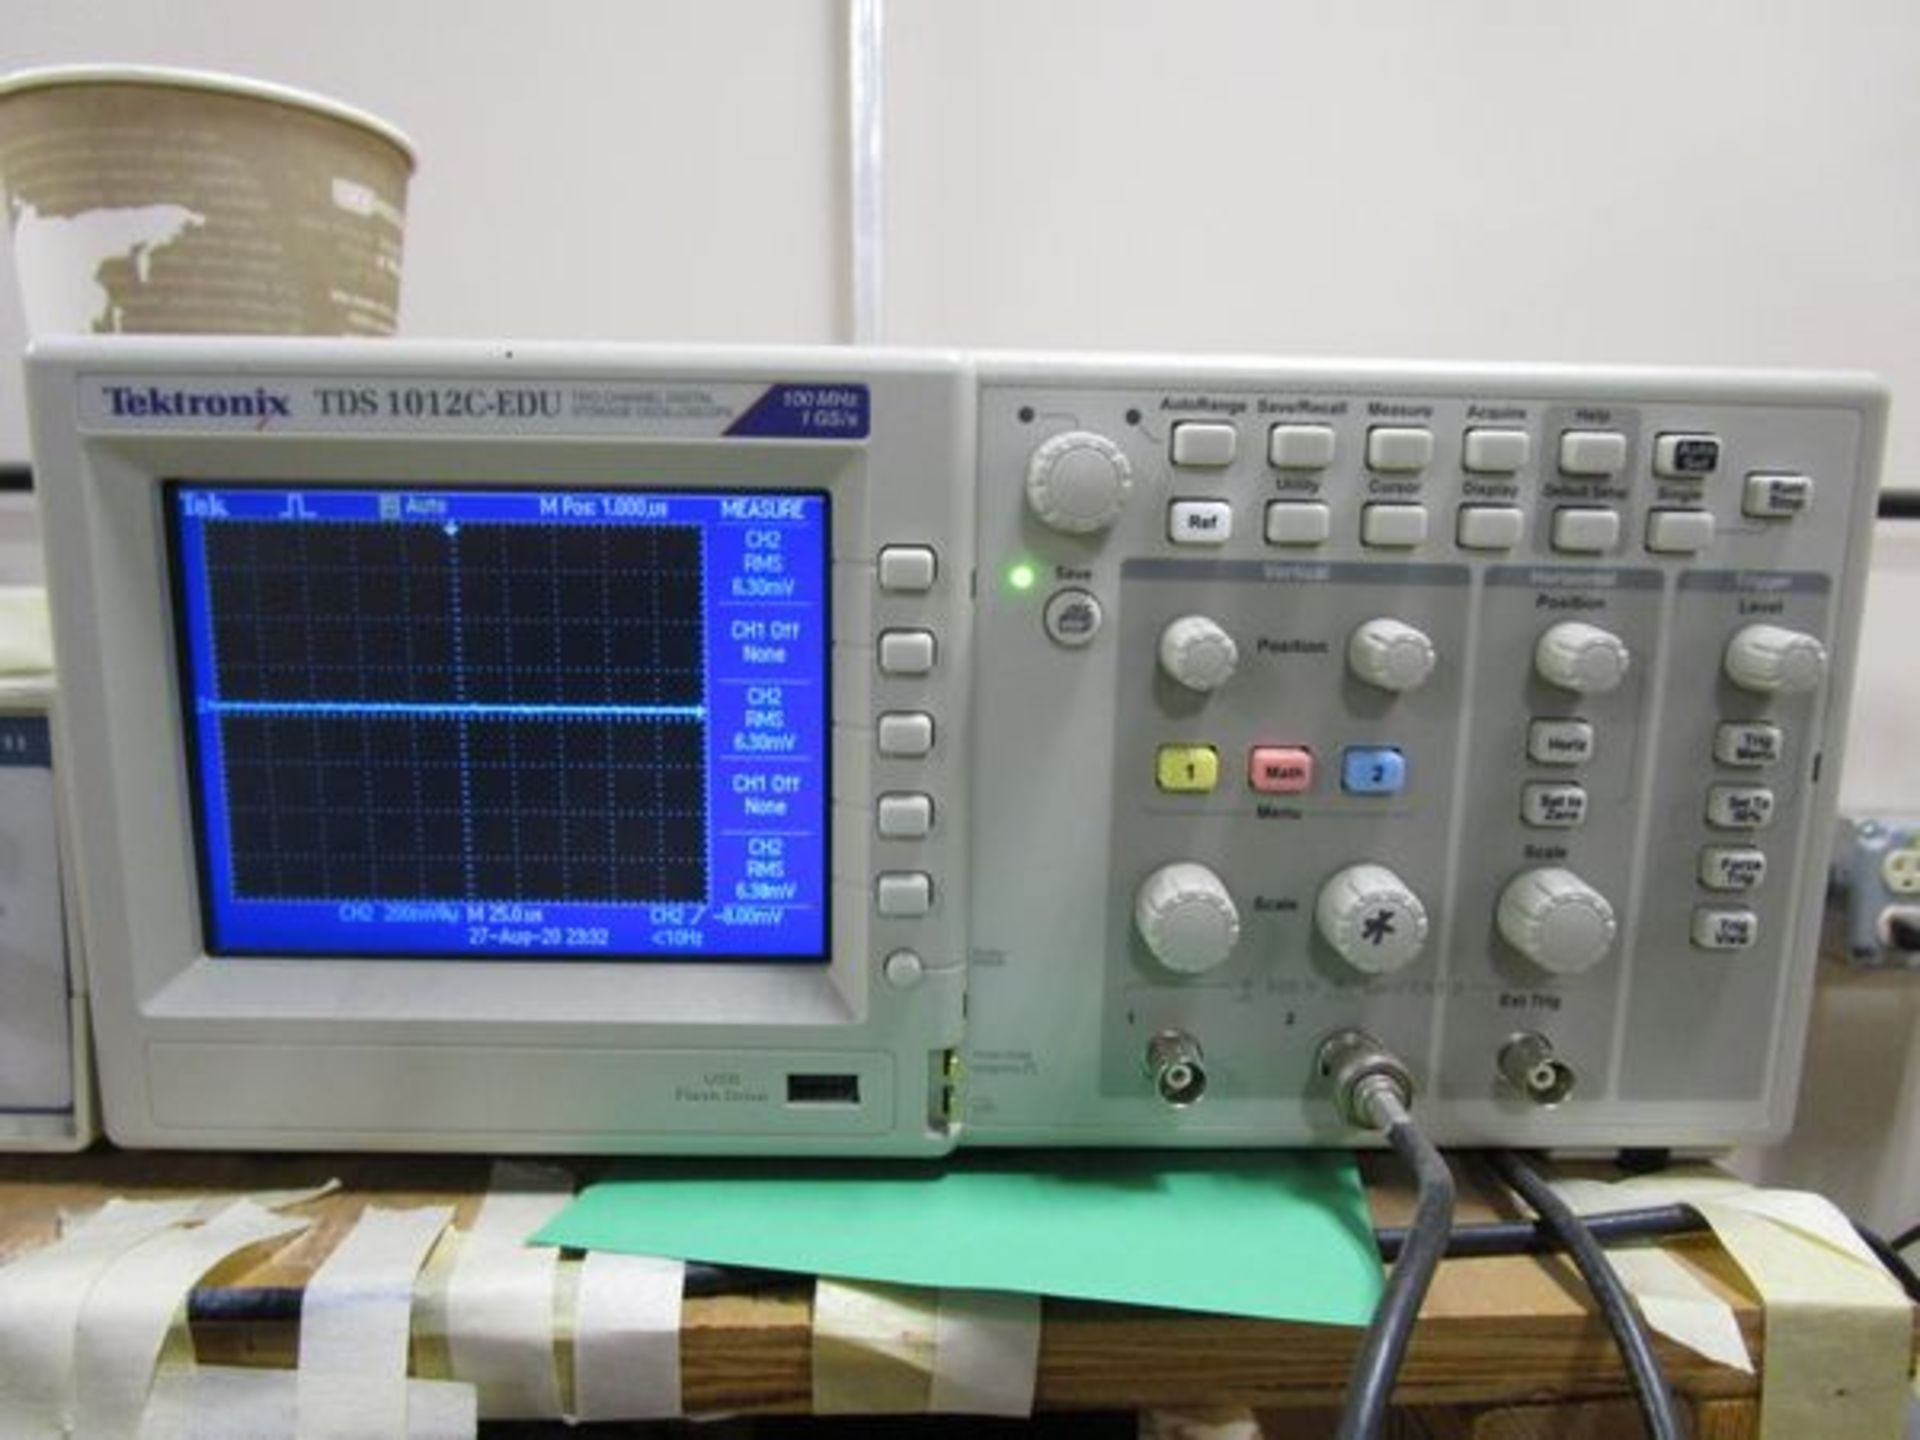 Tektronix TDS-1012C-EDU Oscilliscope